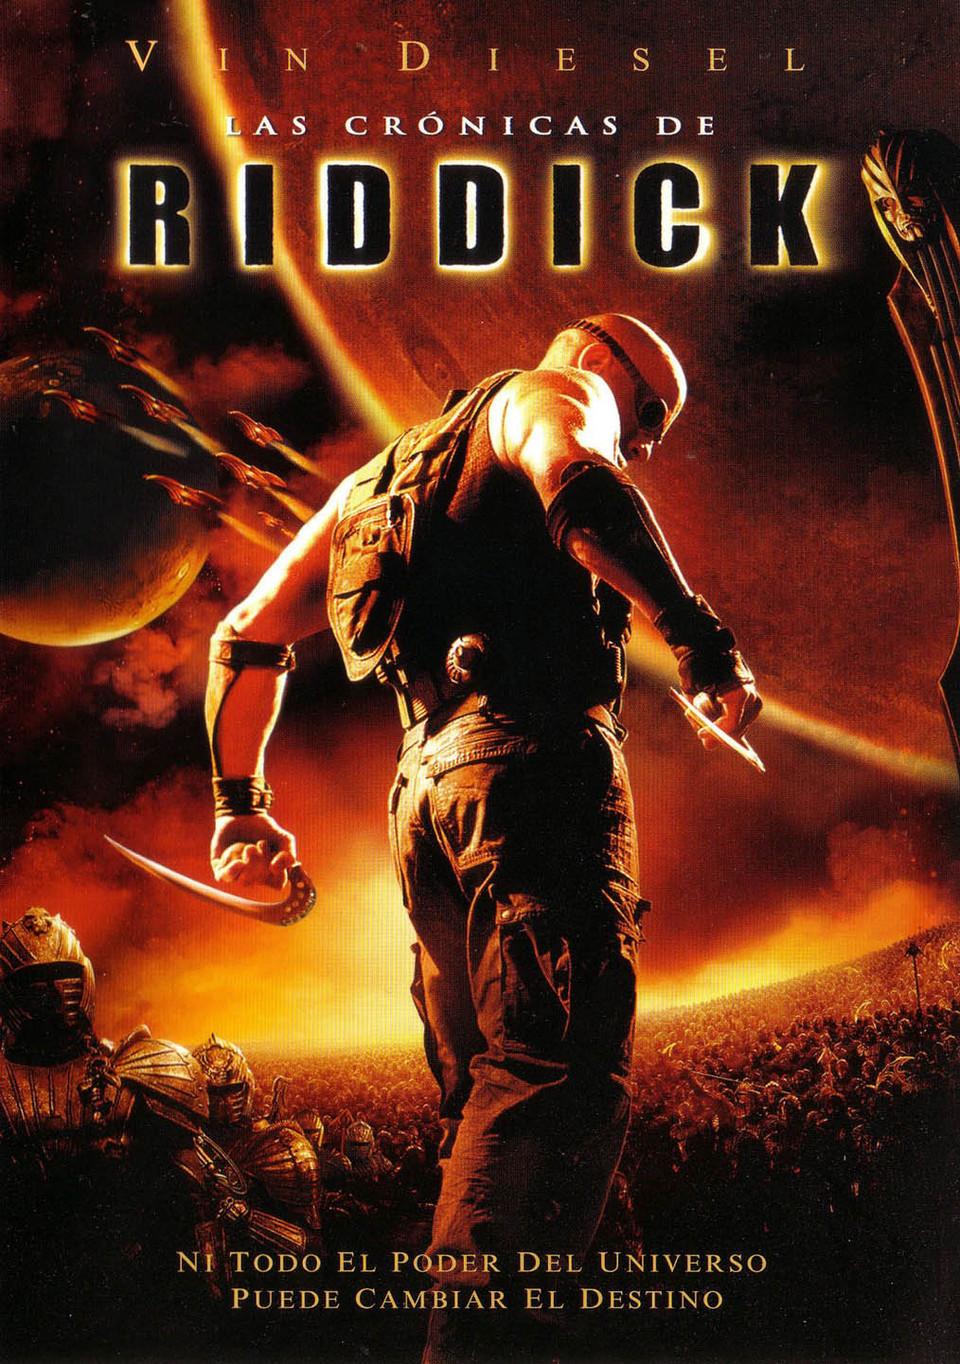 Ridick 2